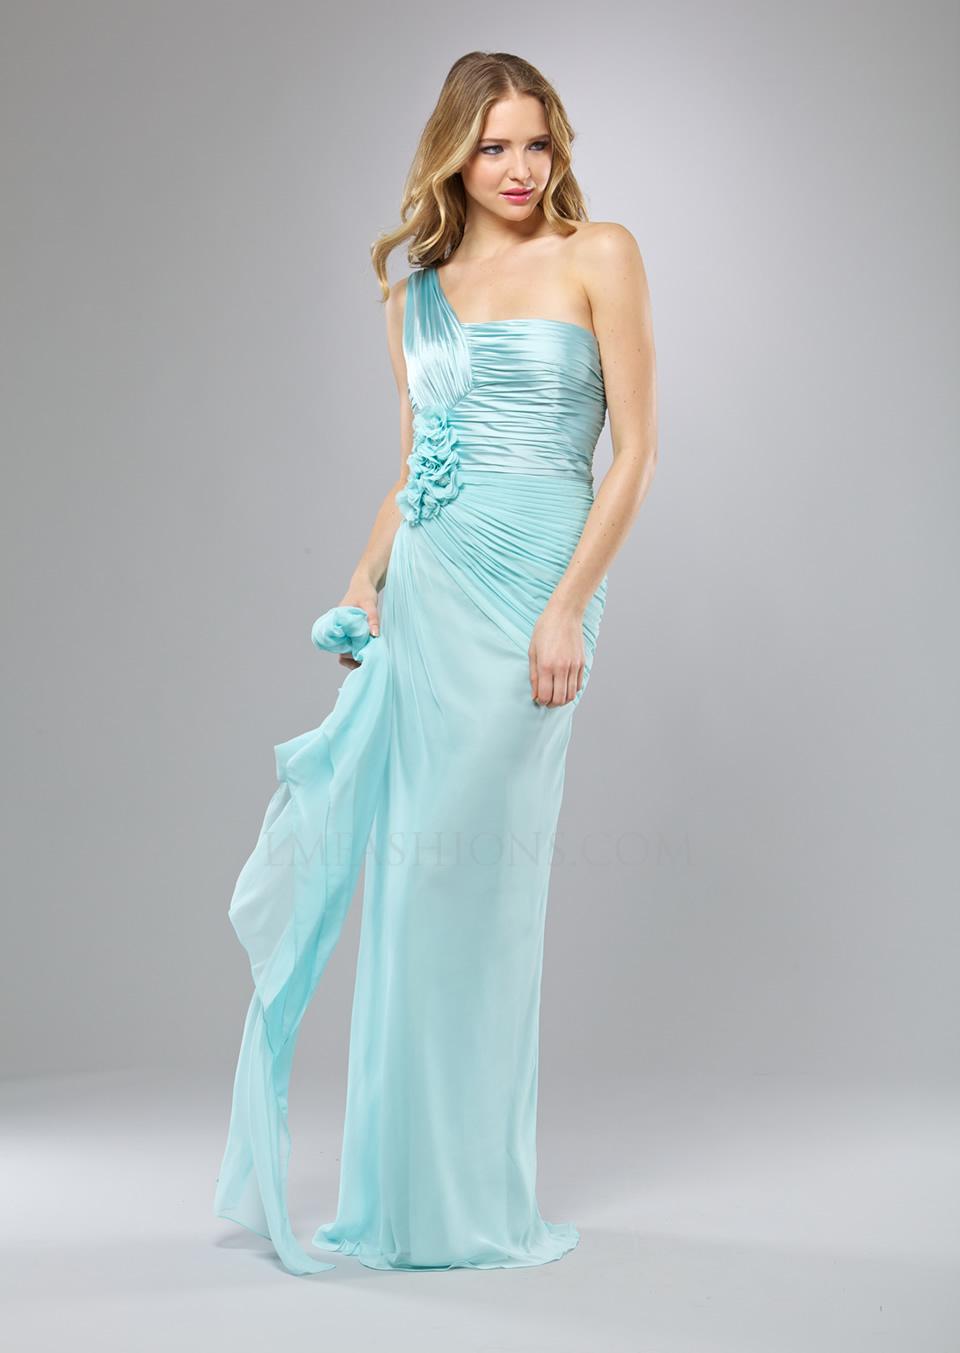 Women Beauty Tips: 15+ Gorgeous Pale Dresses for Women